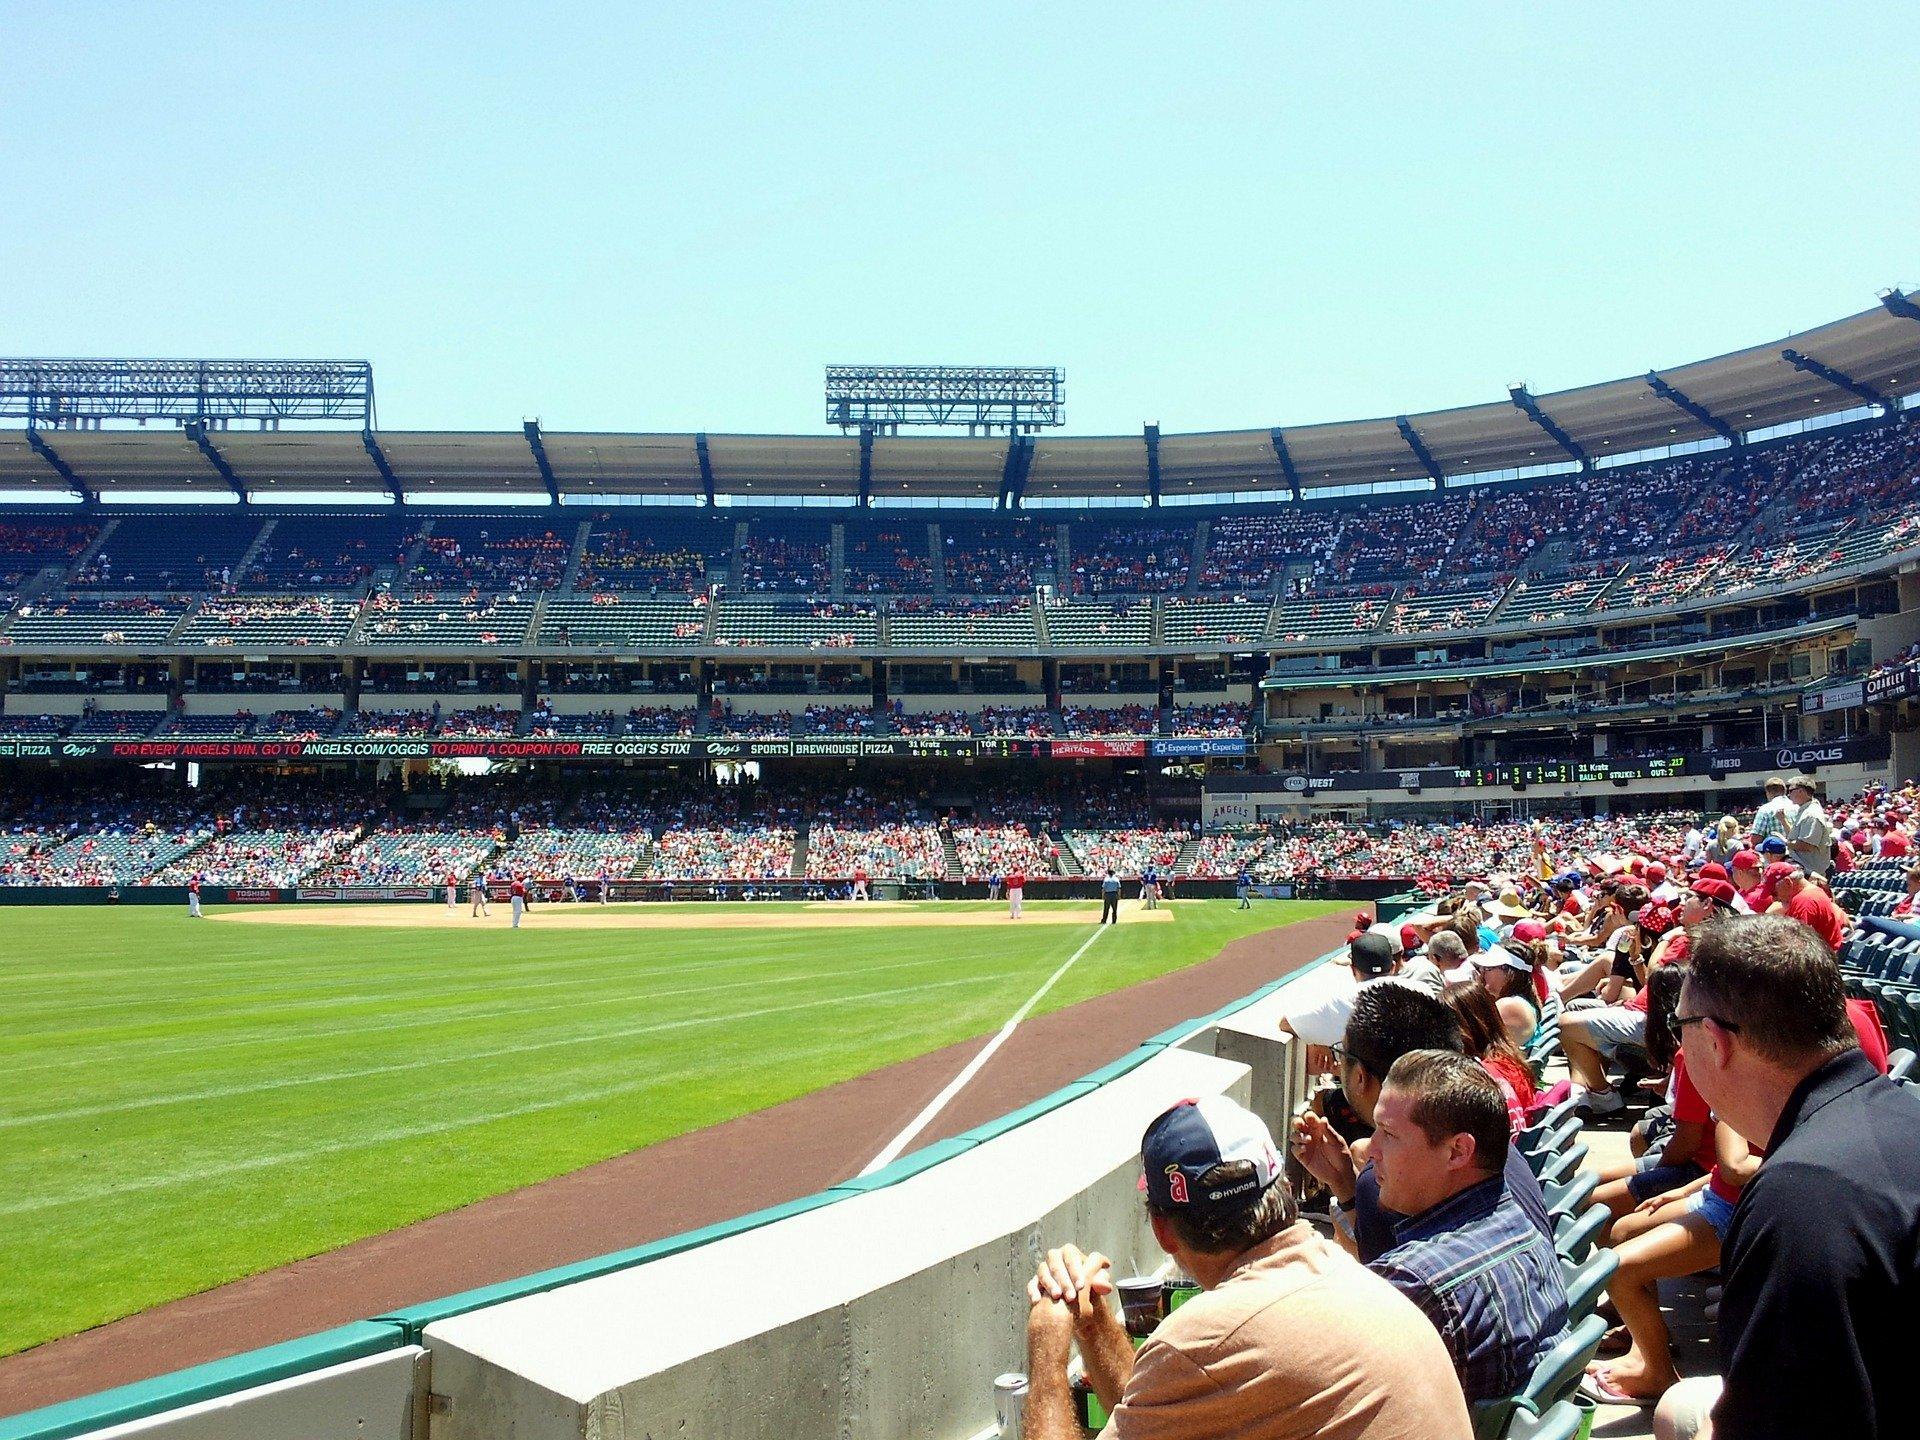 Angel Stadium with Crowd in Anaheim, California